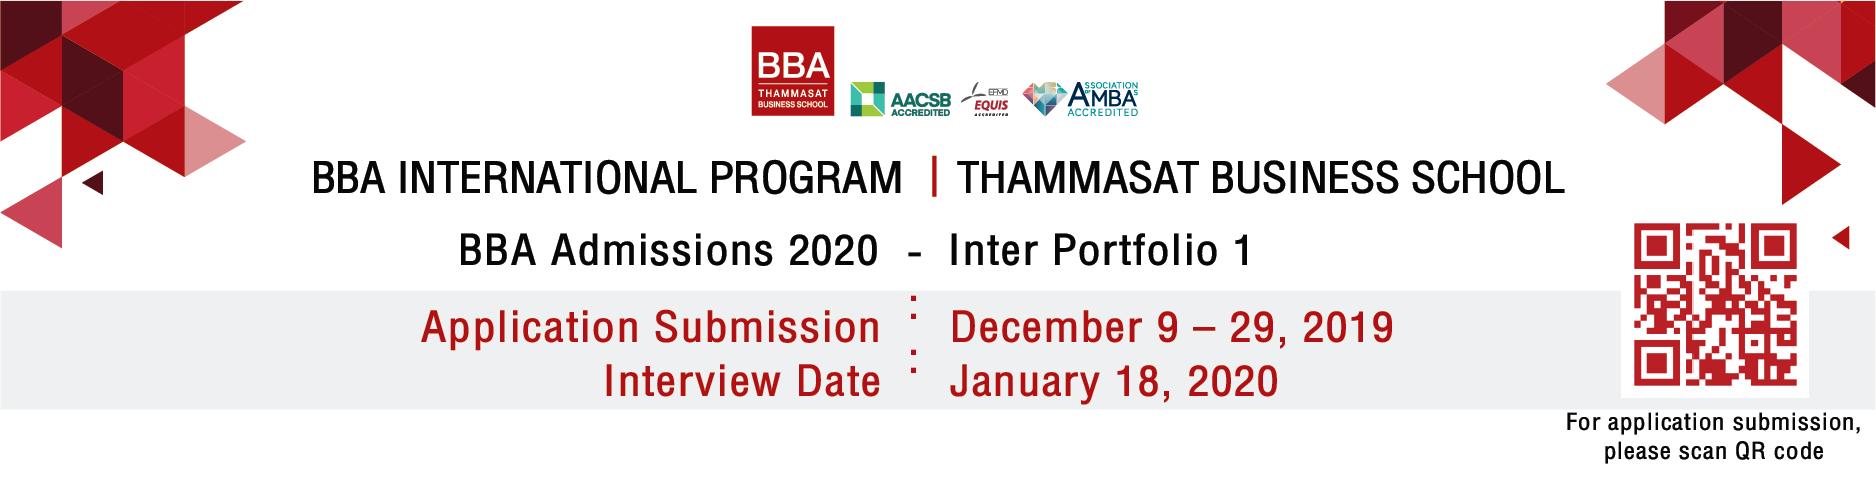 Scac Code List 2020.Bba International Program Thammasat Business School